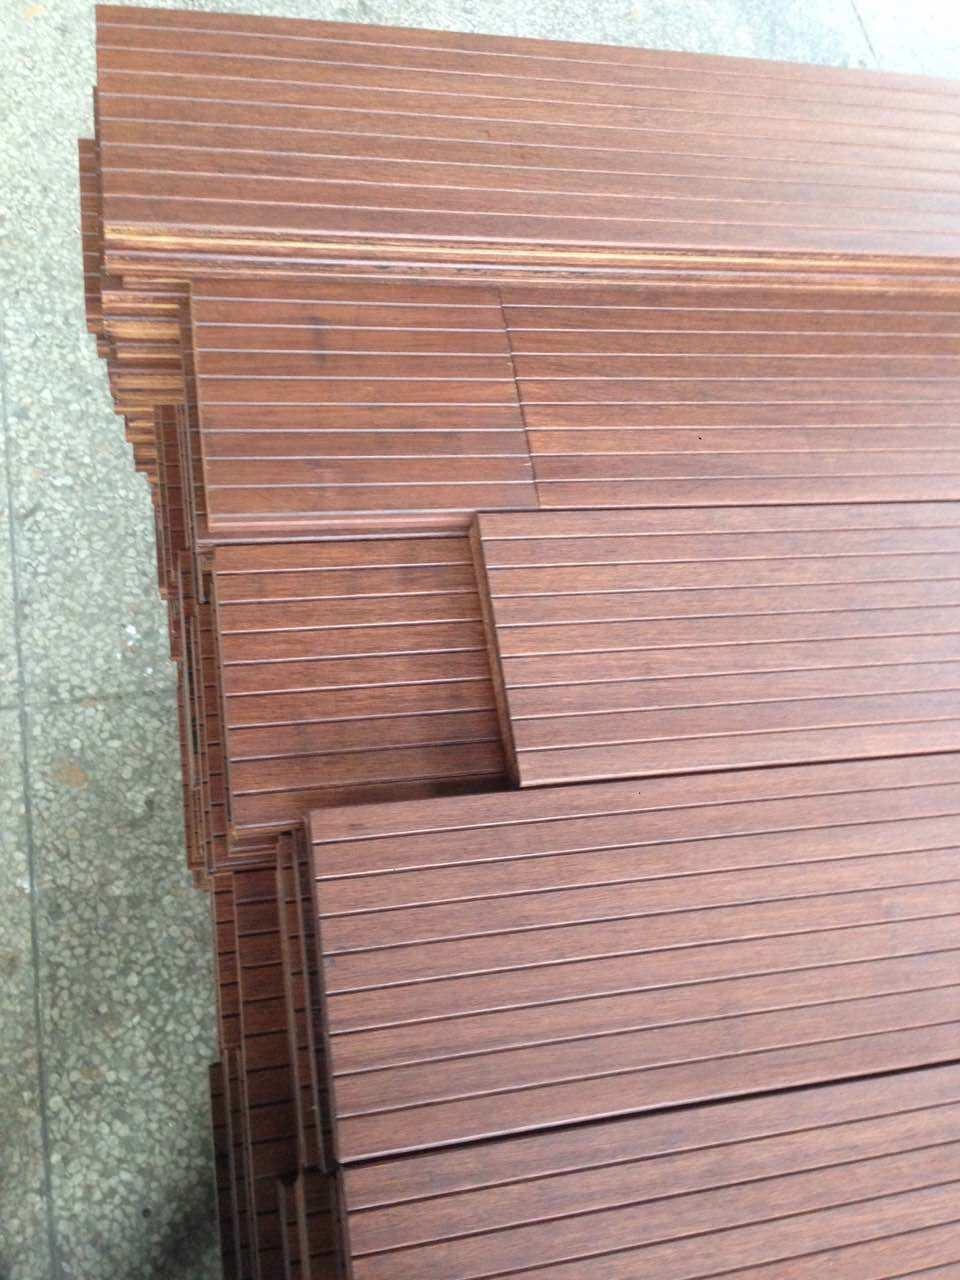 Carbonized Strand Woven Bamboo Non-Slip Bathroom Flooring